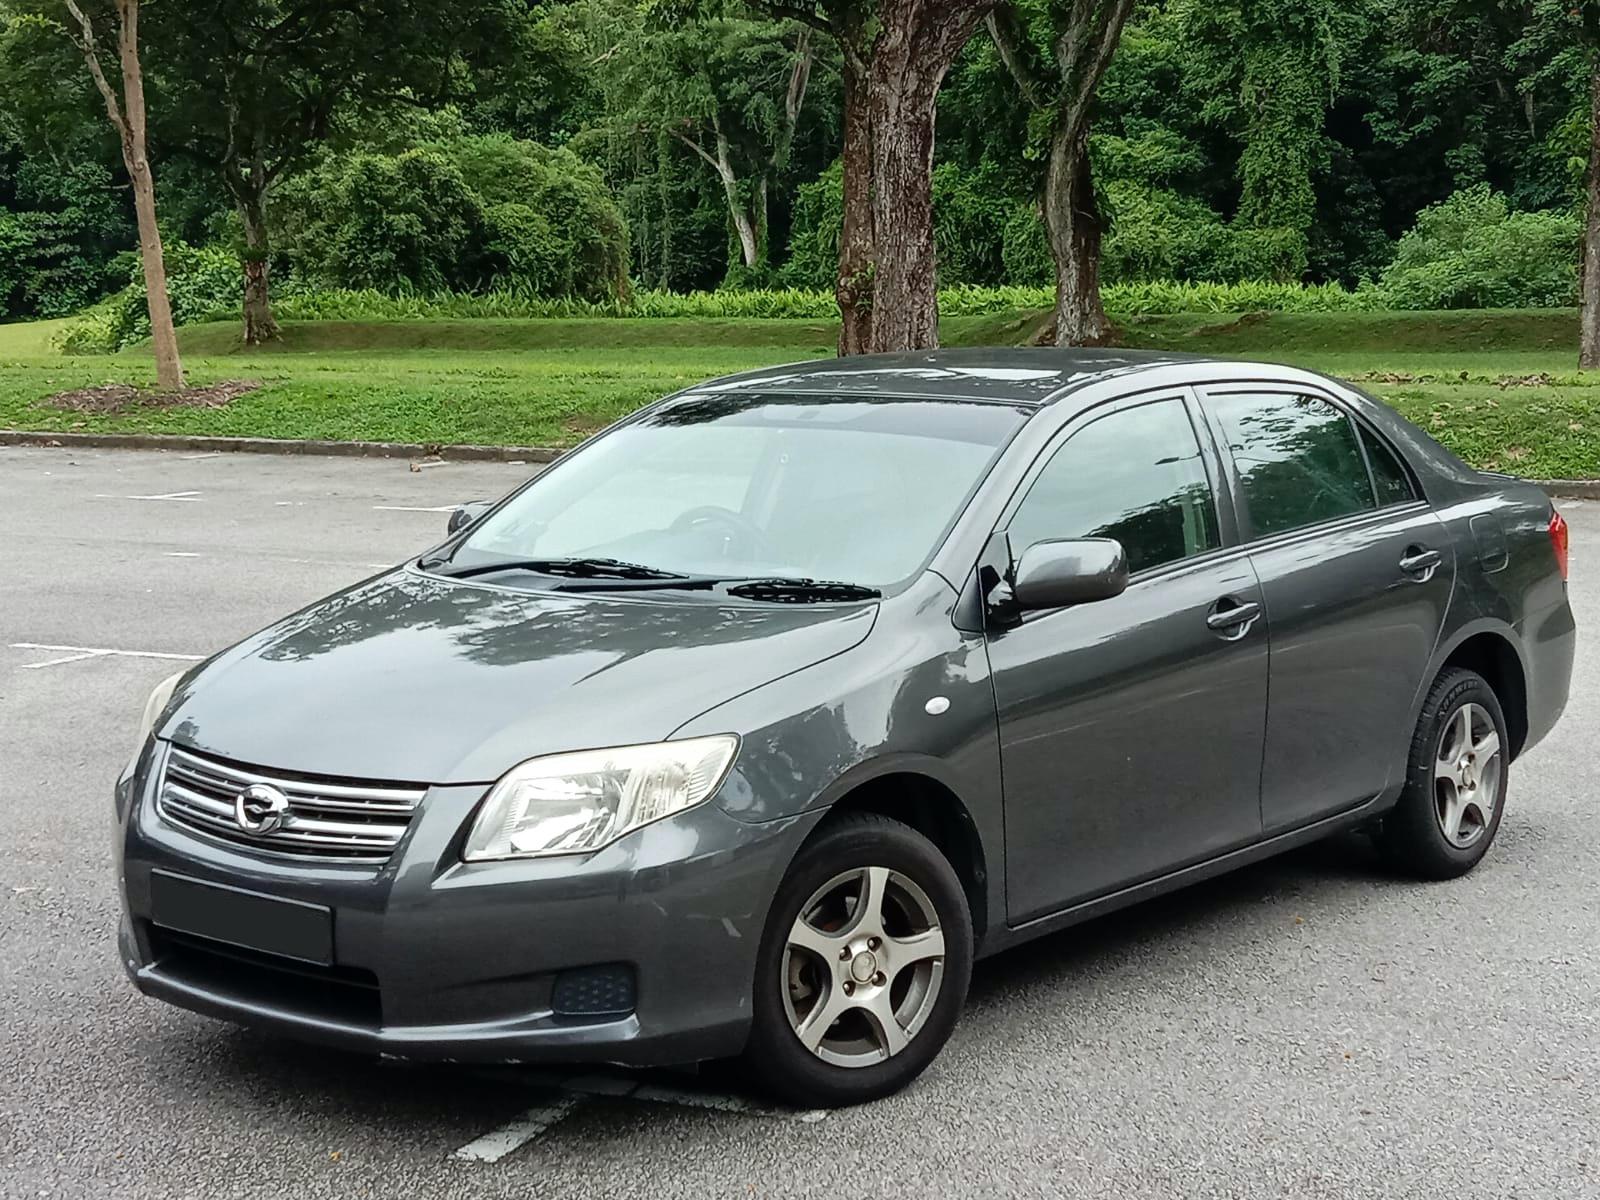 Toyota Corolla Axio (For Rent)